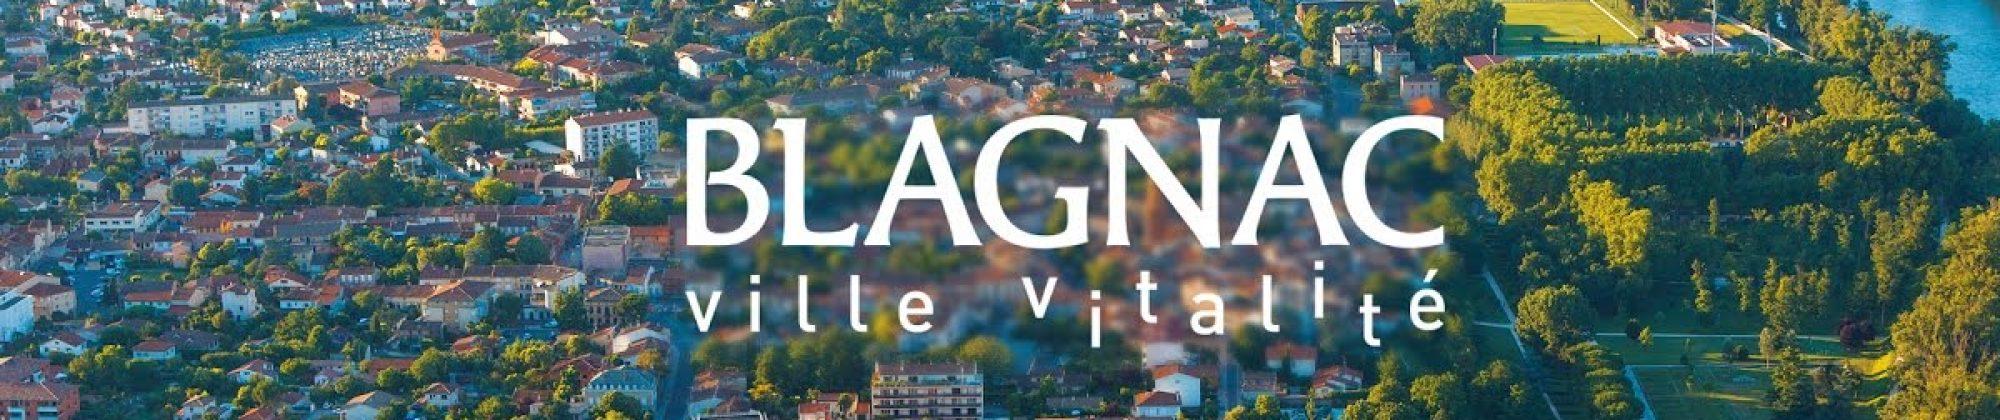 Festival de Scrabble de Blagnac